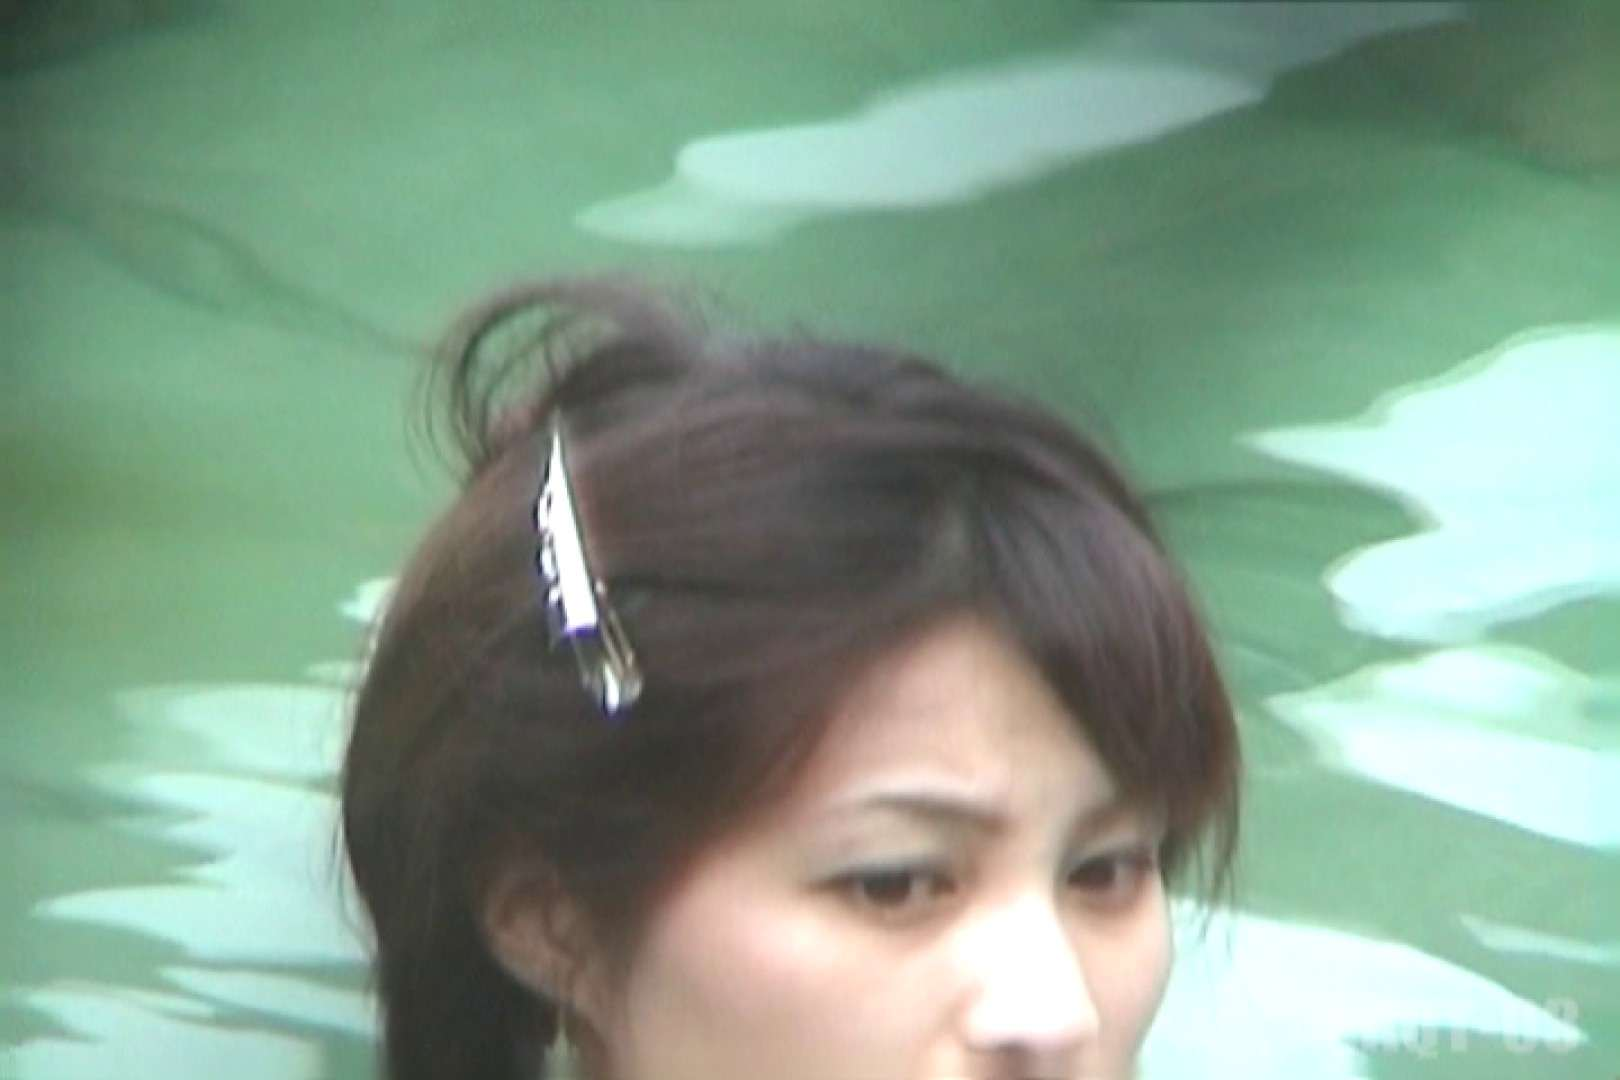 Aquaな露天風呂Vol.727 盗撮   OLエロ画像  110PICs 70